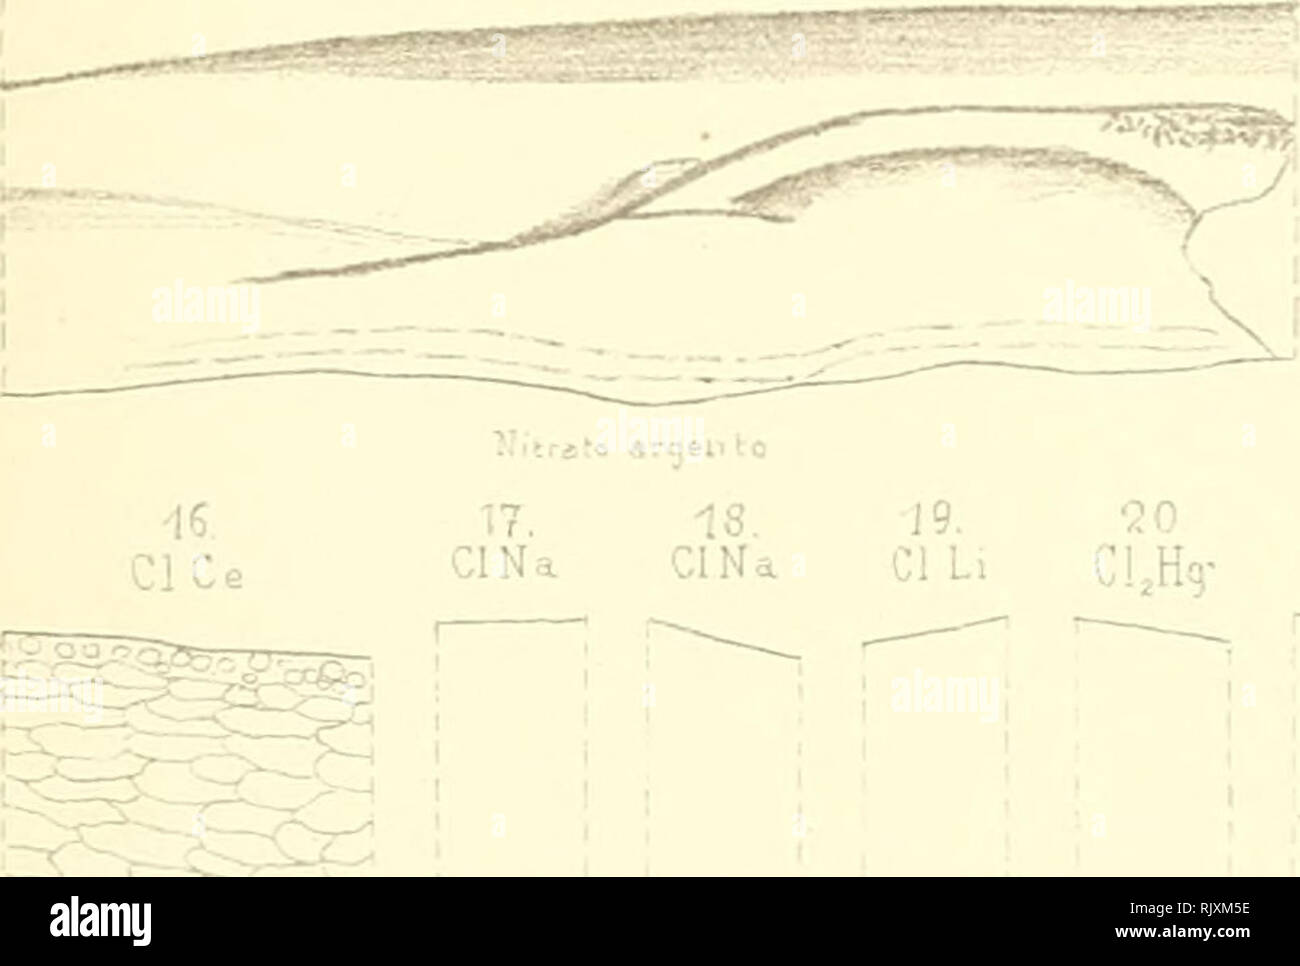 ". Atti. Plants; Plants -- Italy; Cryptogamia; Mycology. Arti cl(>ll Isl? Rorcinko Univ. di Povi.uVol.XI Tav.lX 1 2. 3. 4- 5 6 7. 8. 9. 10. Vò 14. 15. Cy.FeK C^.Fei; Cy.FeK, Cy.FeK, Cl^Hg Cl,Hg CI K CI K CI Ce CI Ce CU,.,.... ClNa ClNa 'Â« ° ^%? ^xV ^$s PMNO;/ 'â PMNO,), i/uo'uuit' o.iru ""g^a *Â«Â«oS -etrii'. ;rj^ nm, -â' ^= AgNO, AqNO,. 19. â¢JO 21 CIL, C!,H9- CLHg .i.»'j A,jNC, 12. AqNO, :1K 25. CIK 27. AoMO. g""""} AgNO, AqNO, 26. Aqh A,-HO, 30. AqNO, AgNOj 23. V '''tór' L.Buscalioni del. lil.Tacctiinardi jLperrarì.Pavii. Buscalionie Purgotti-Dissoc.e diffus.deijoni.. P Stock Photo"